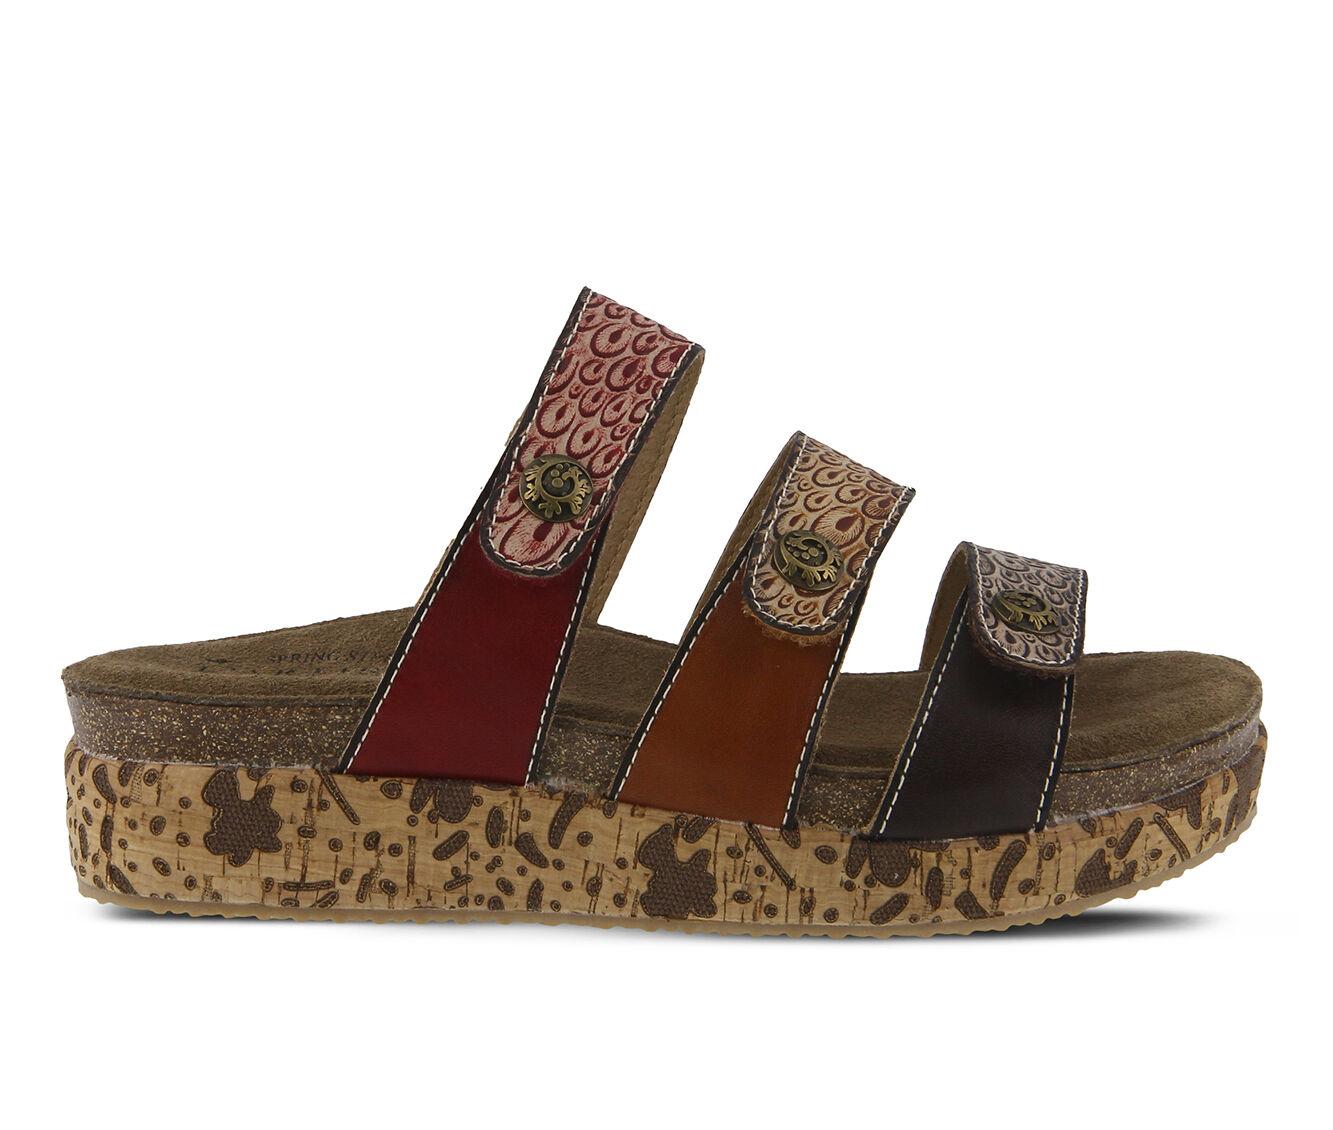 Women's L'ARTISTE Keena Flatform Sandals Brown Multi